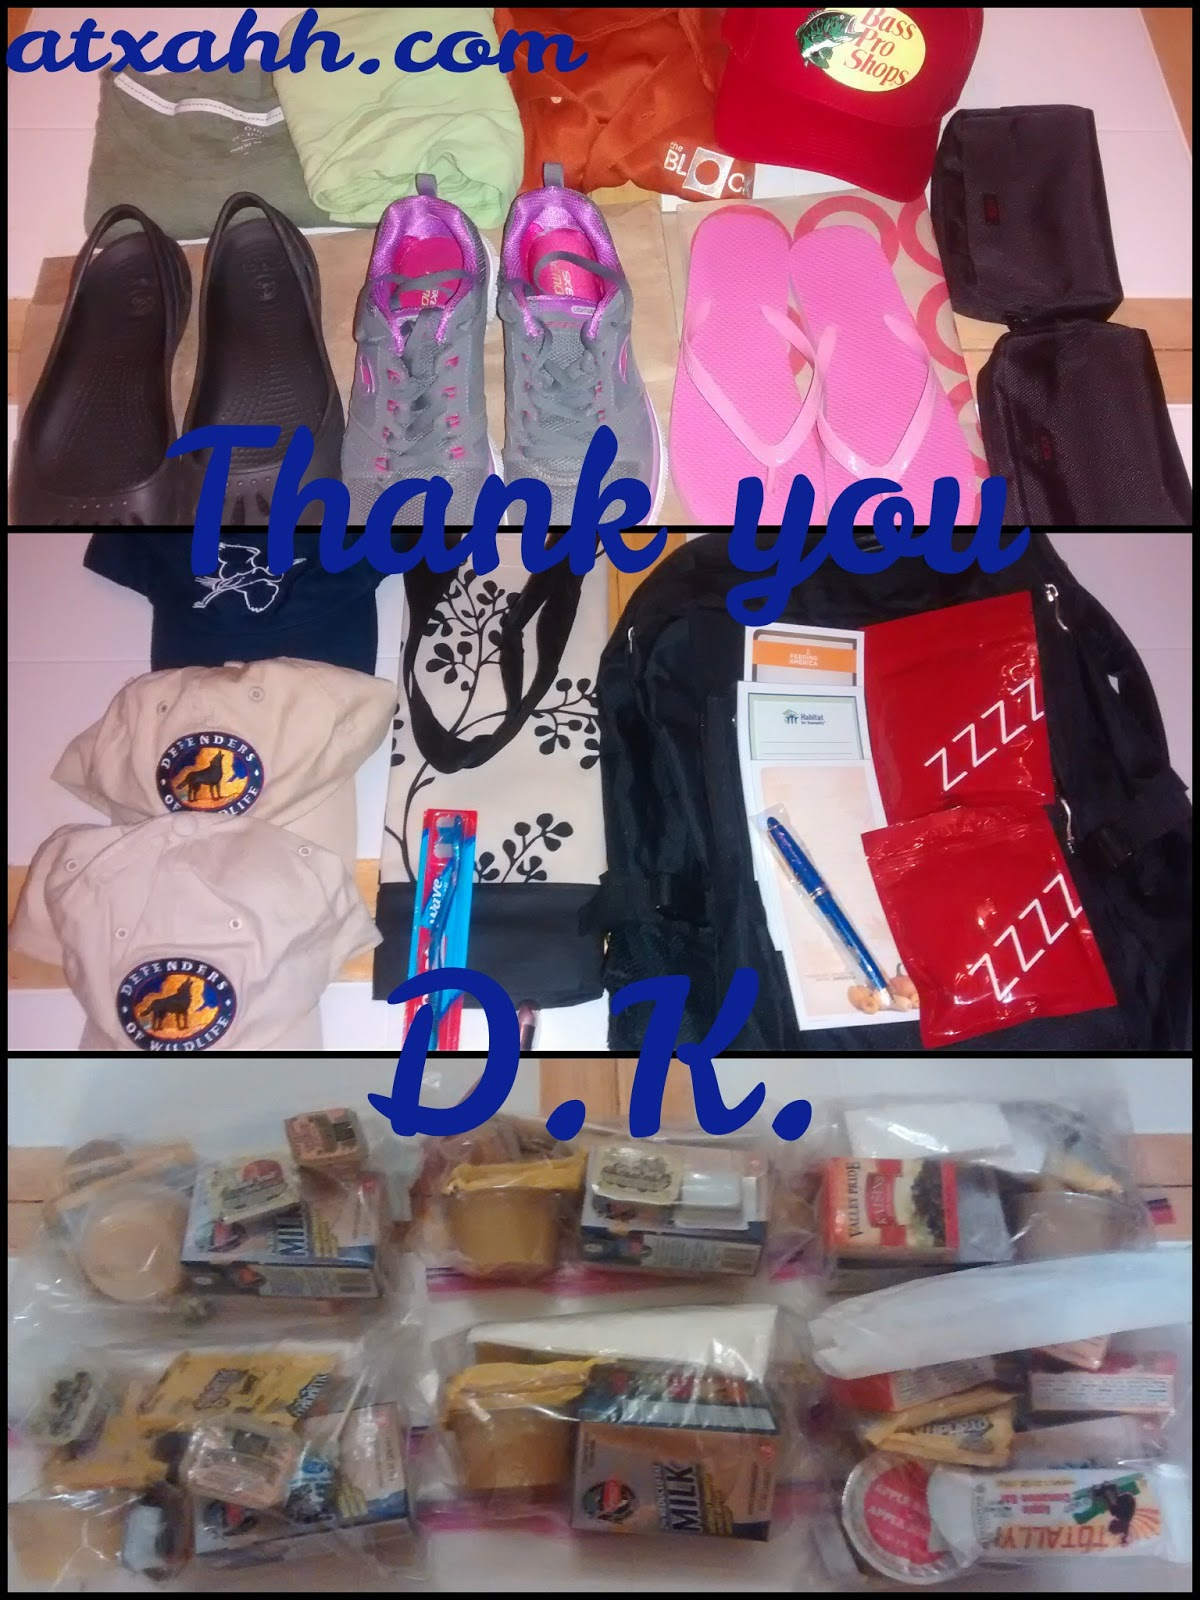 DK donation